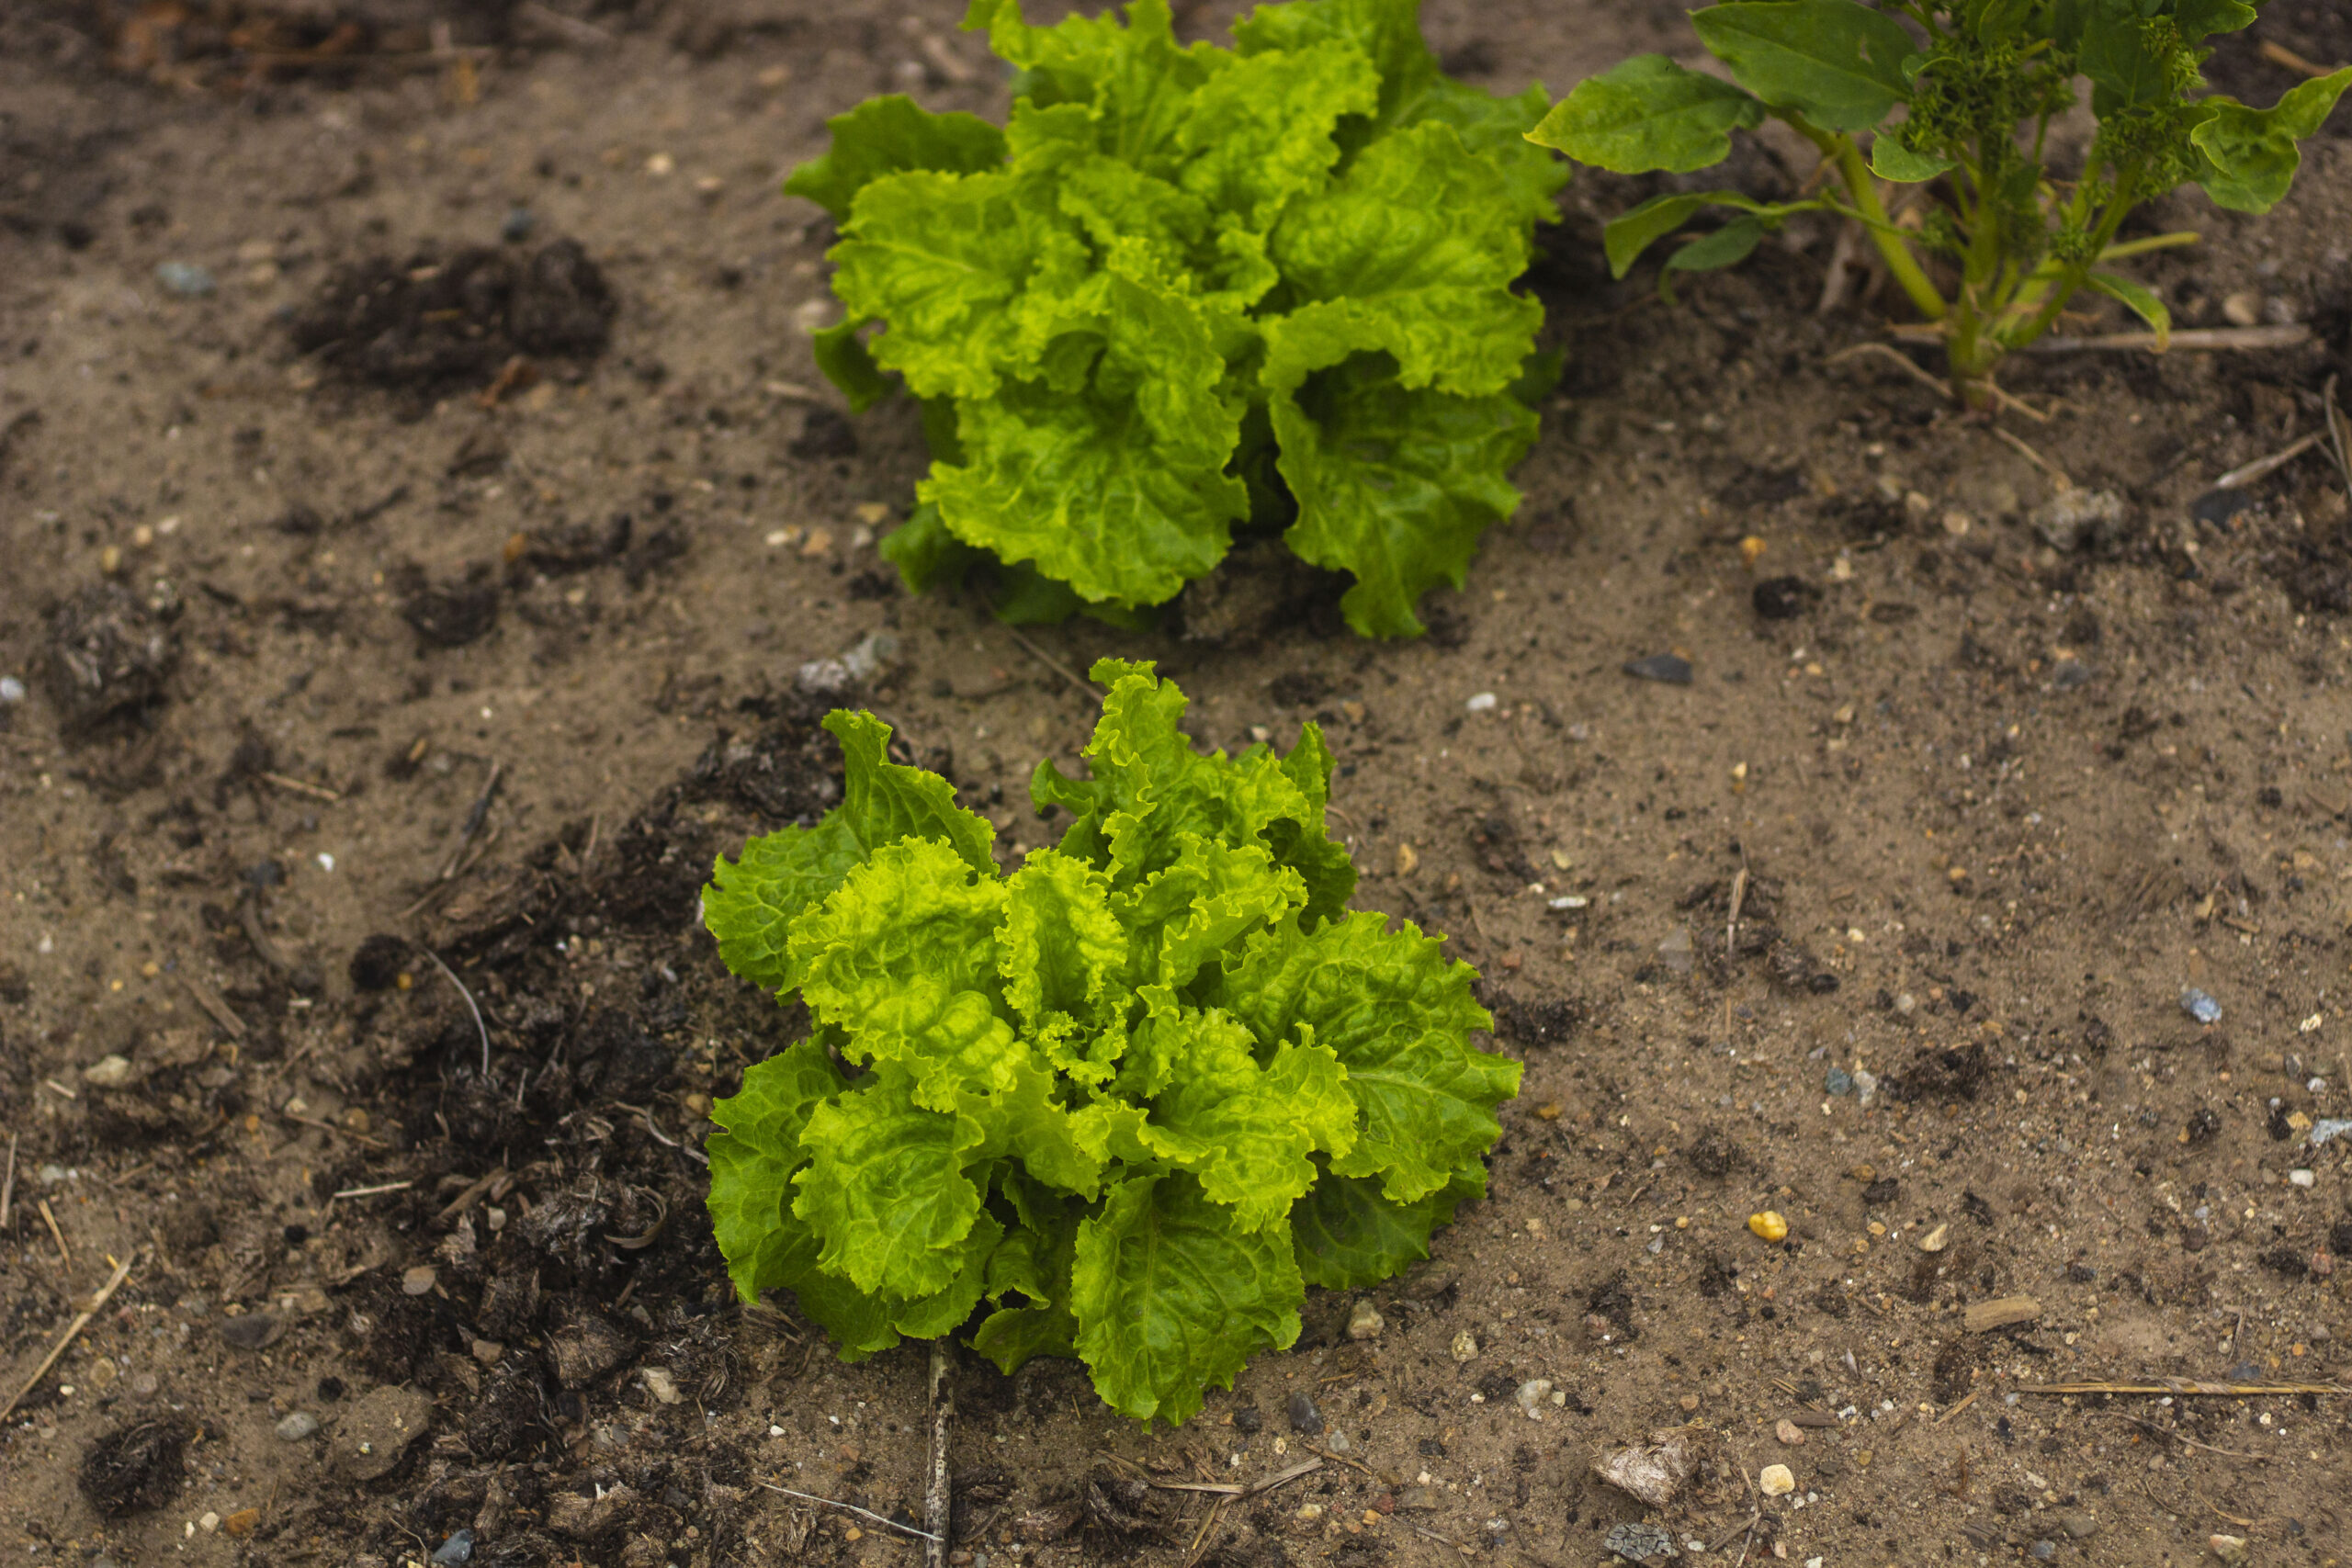 Plant ofte salat i haven